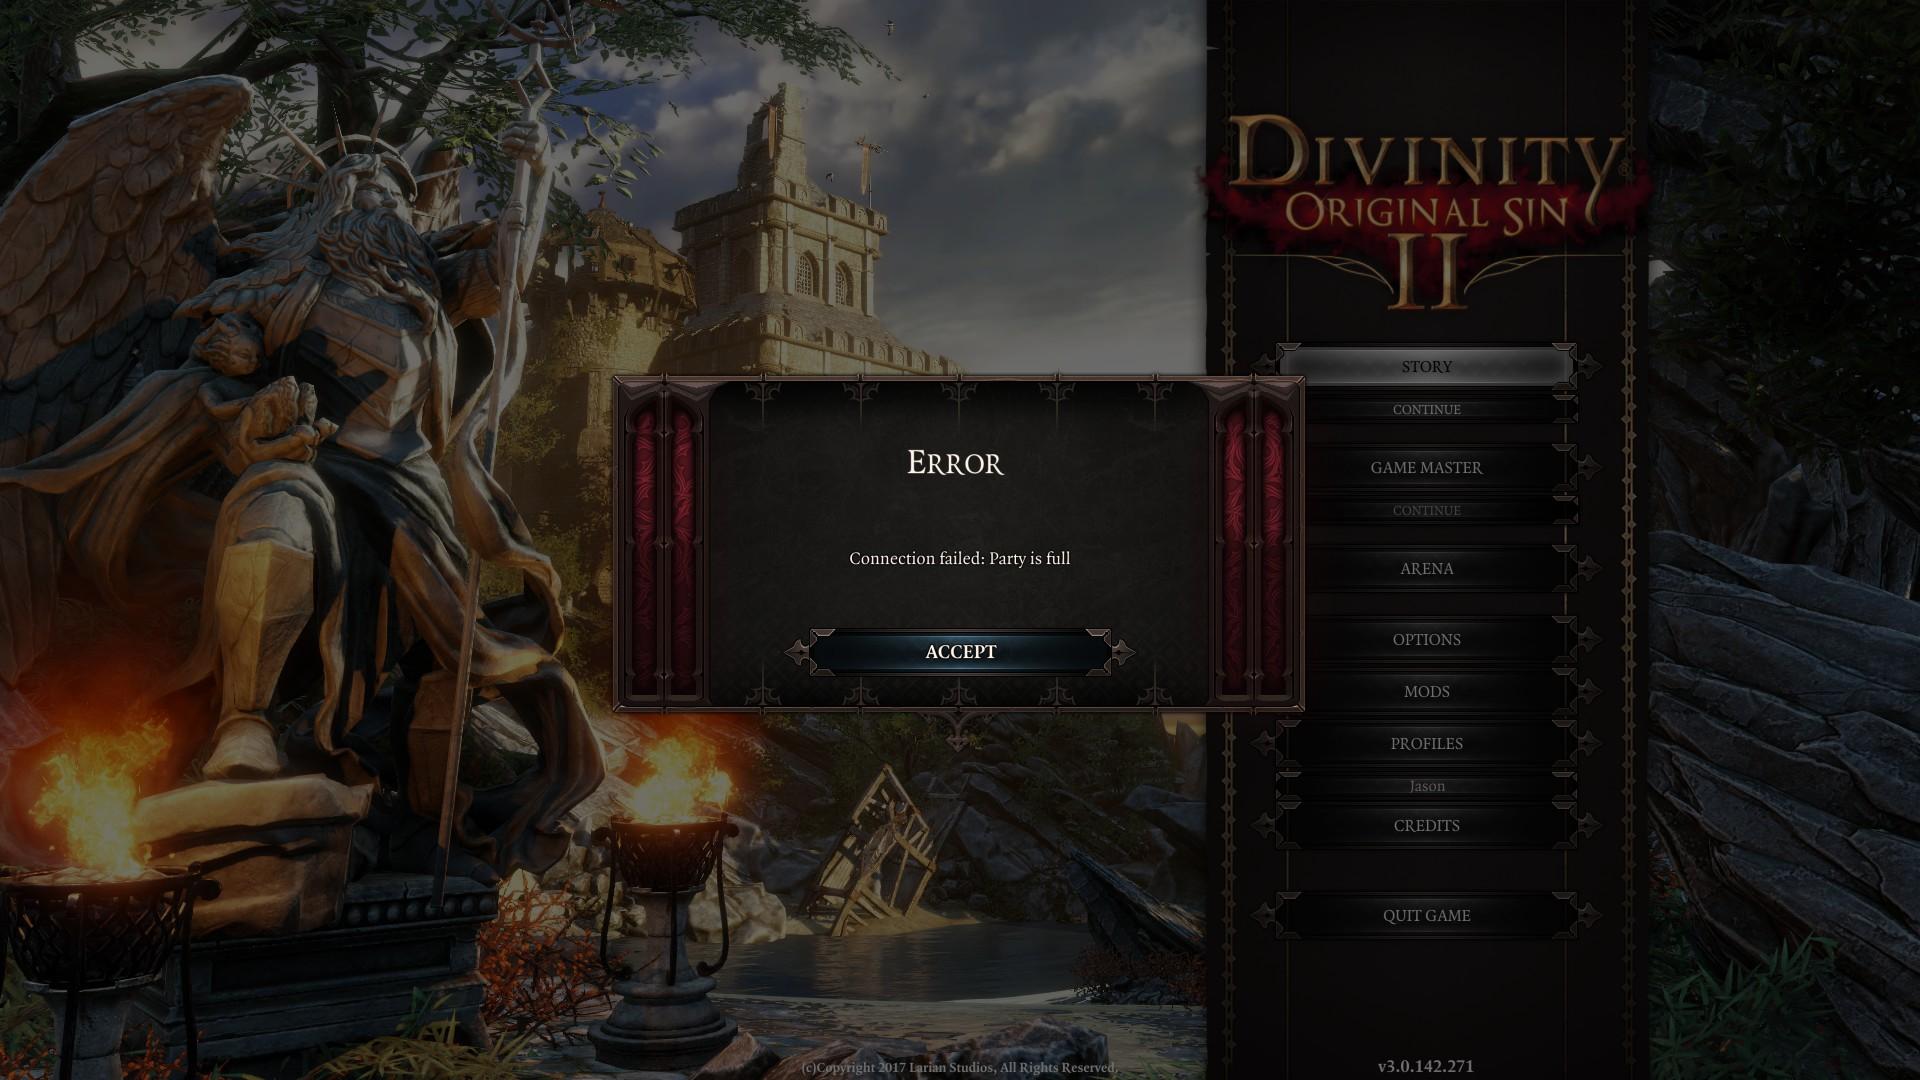 Co-Optimus - News - Divinity: Original Sin II Co-Op FAQ